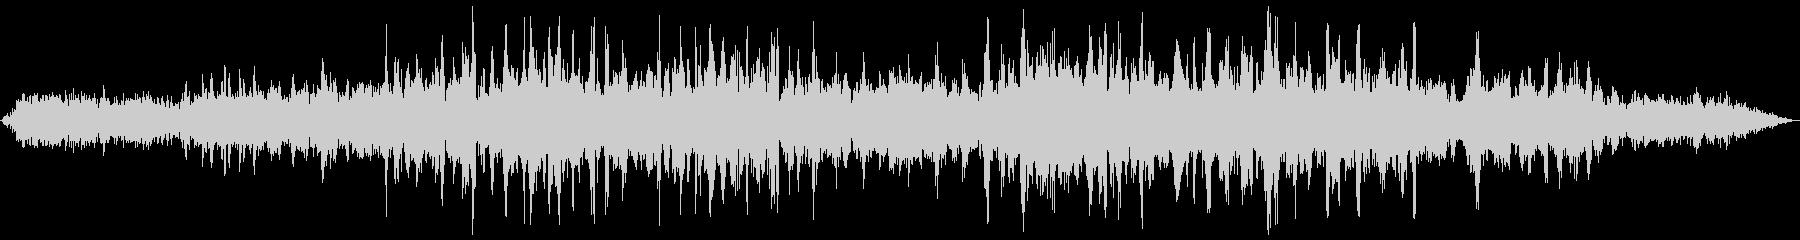 ALIEN RADIO CHATT...の未再生の波形